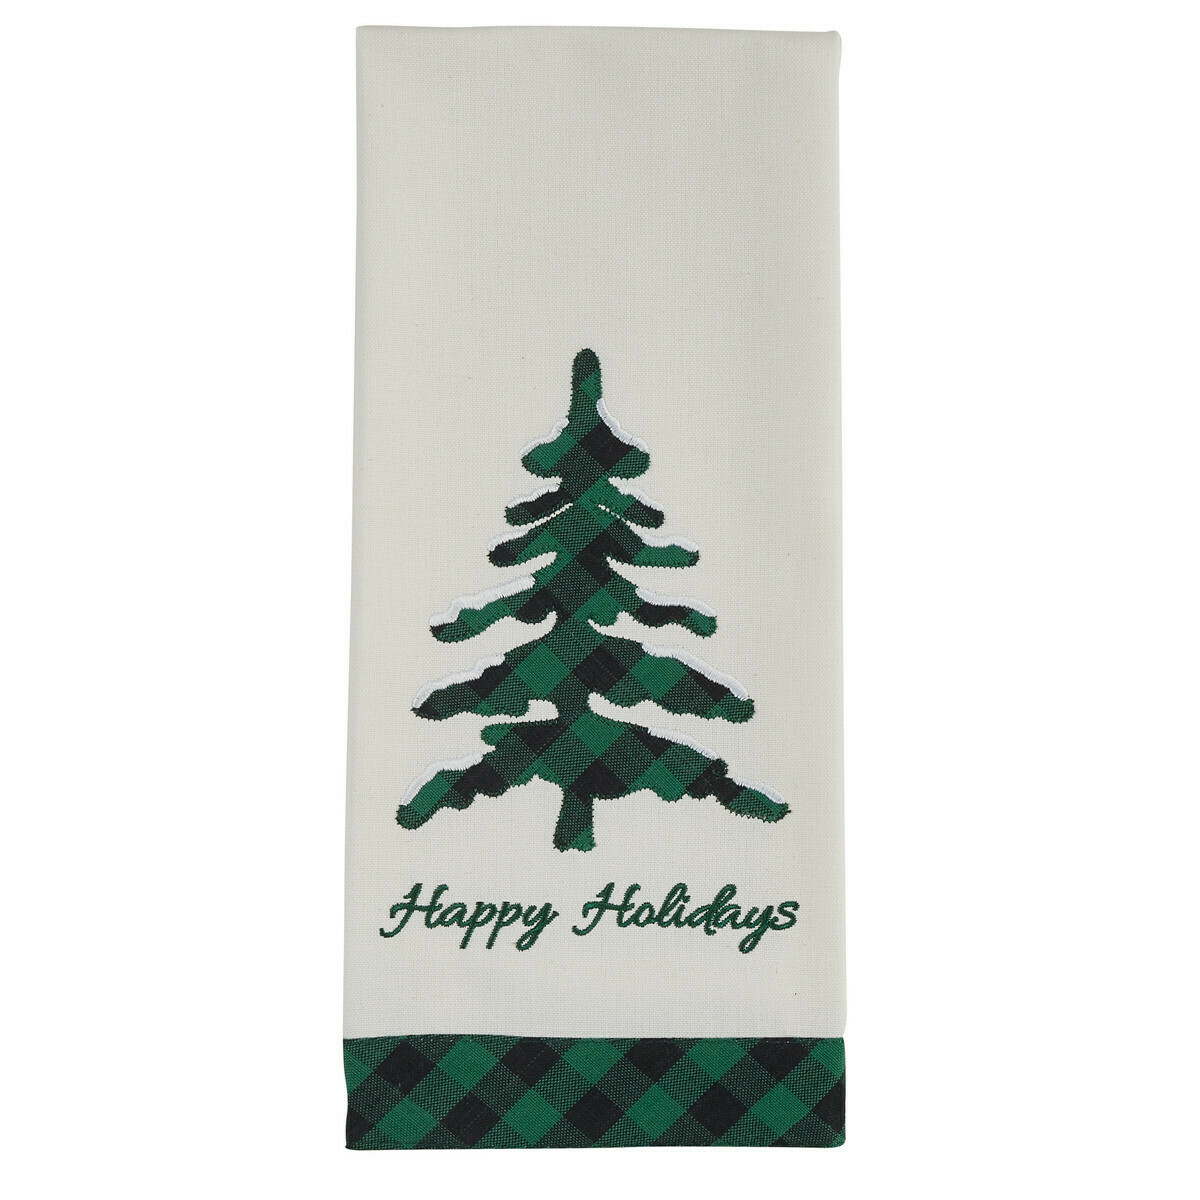 Happy Holidays Applique Dishtowel